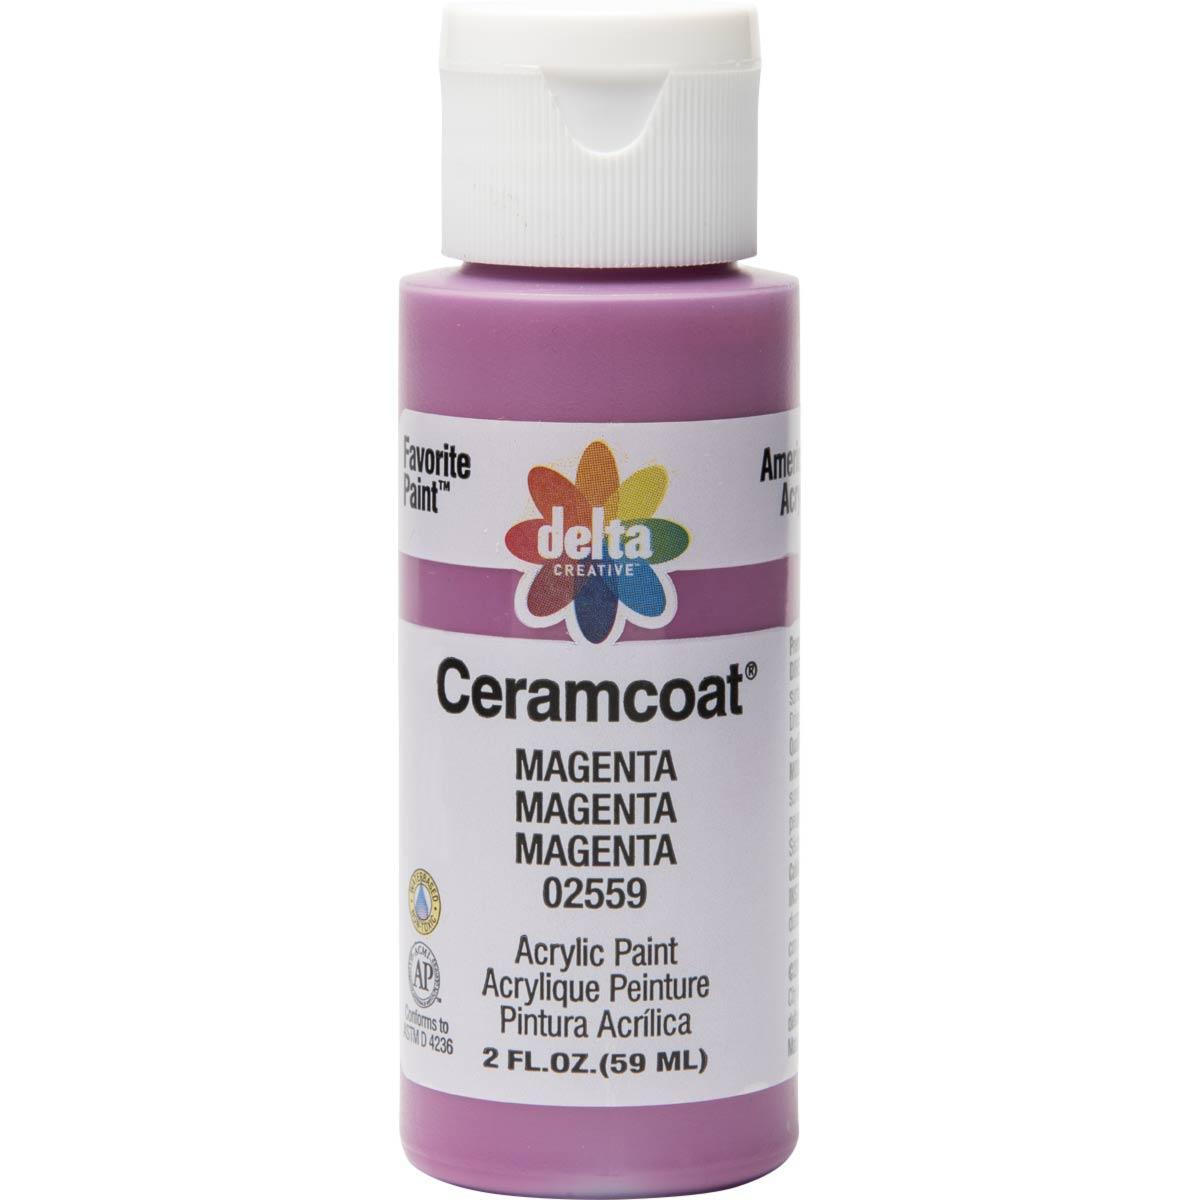 Delta Ceramcoat ® Acrylic Paint - Magenta, 2 oz. - 025590202W